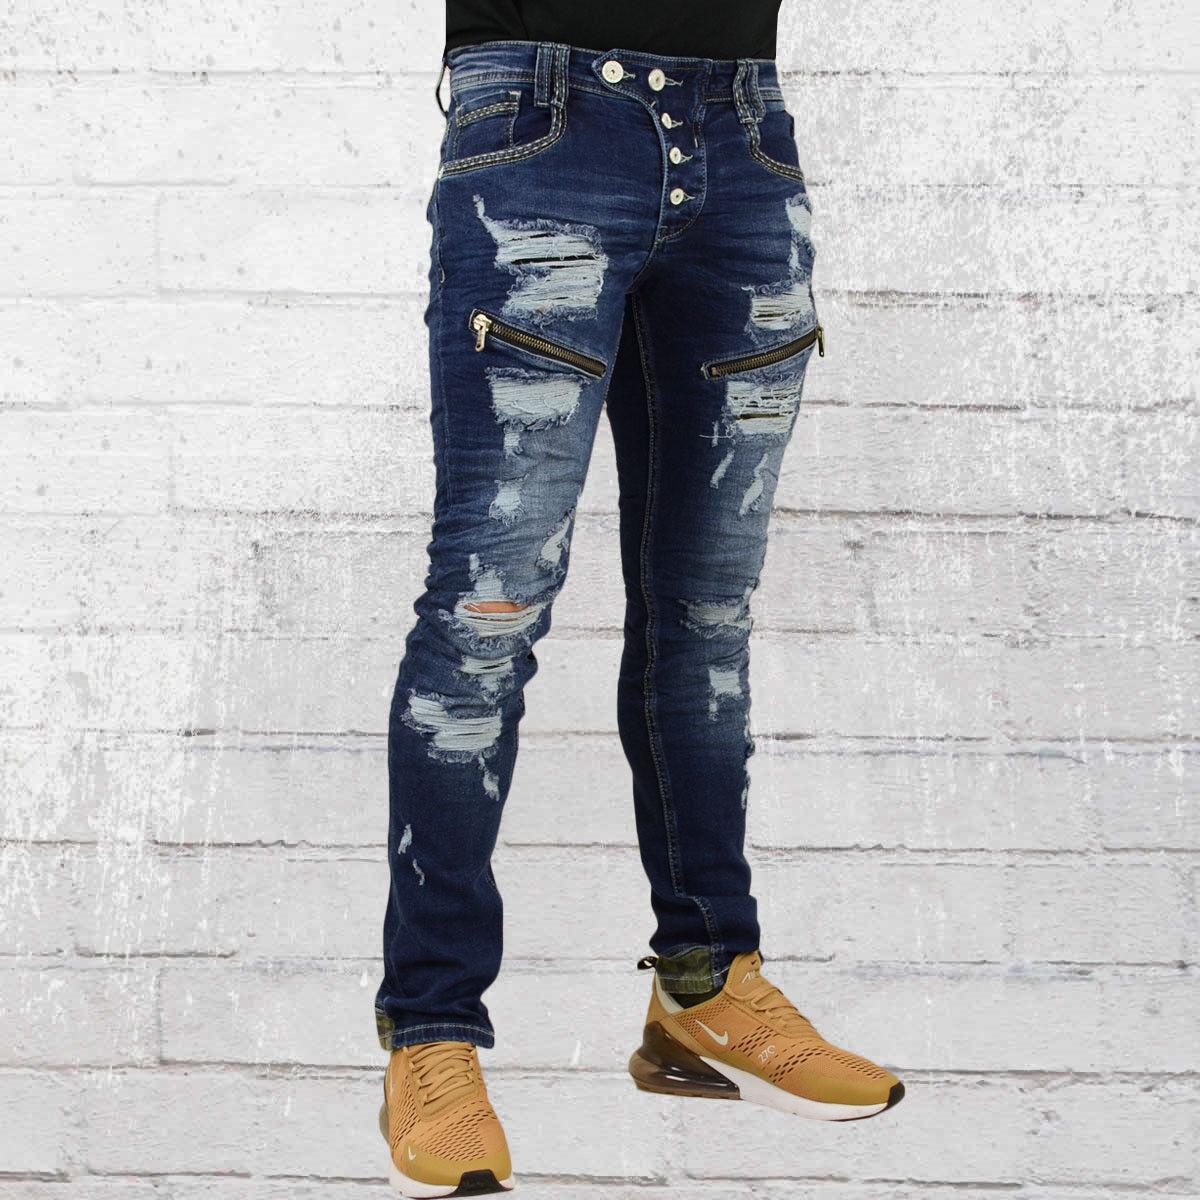 Rusty Neal Uomini Jeans-Pantaloni Nanga blu scuro uomo pantaloni pantaloni pantaloni denim pants 8489b7